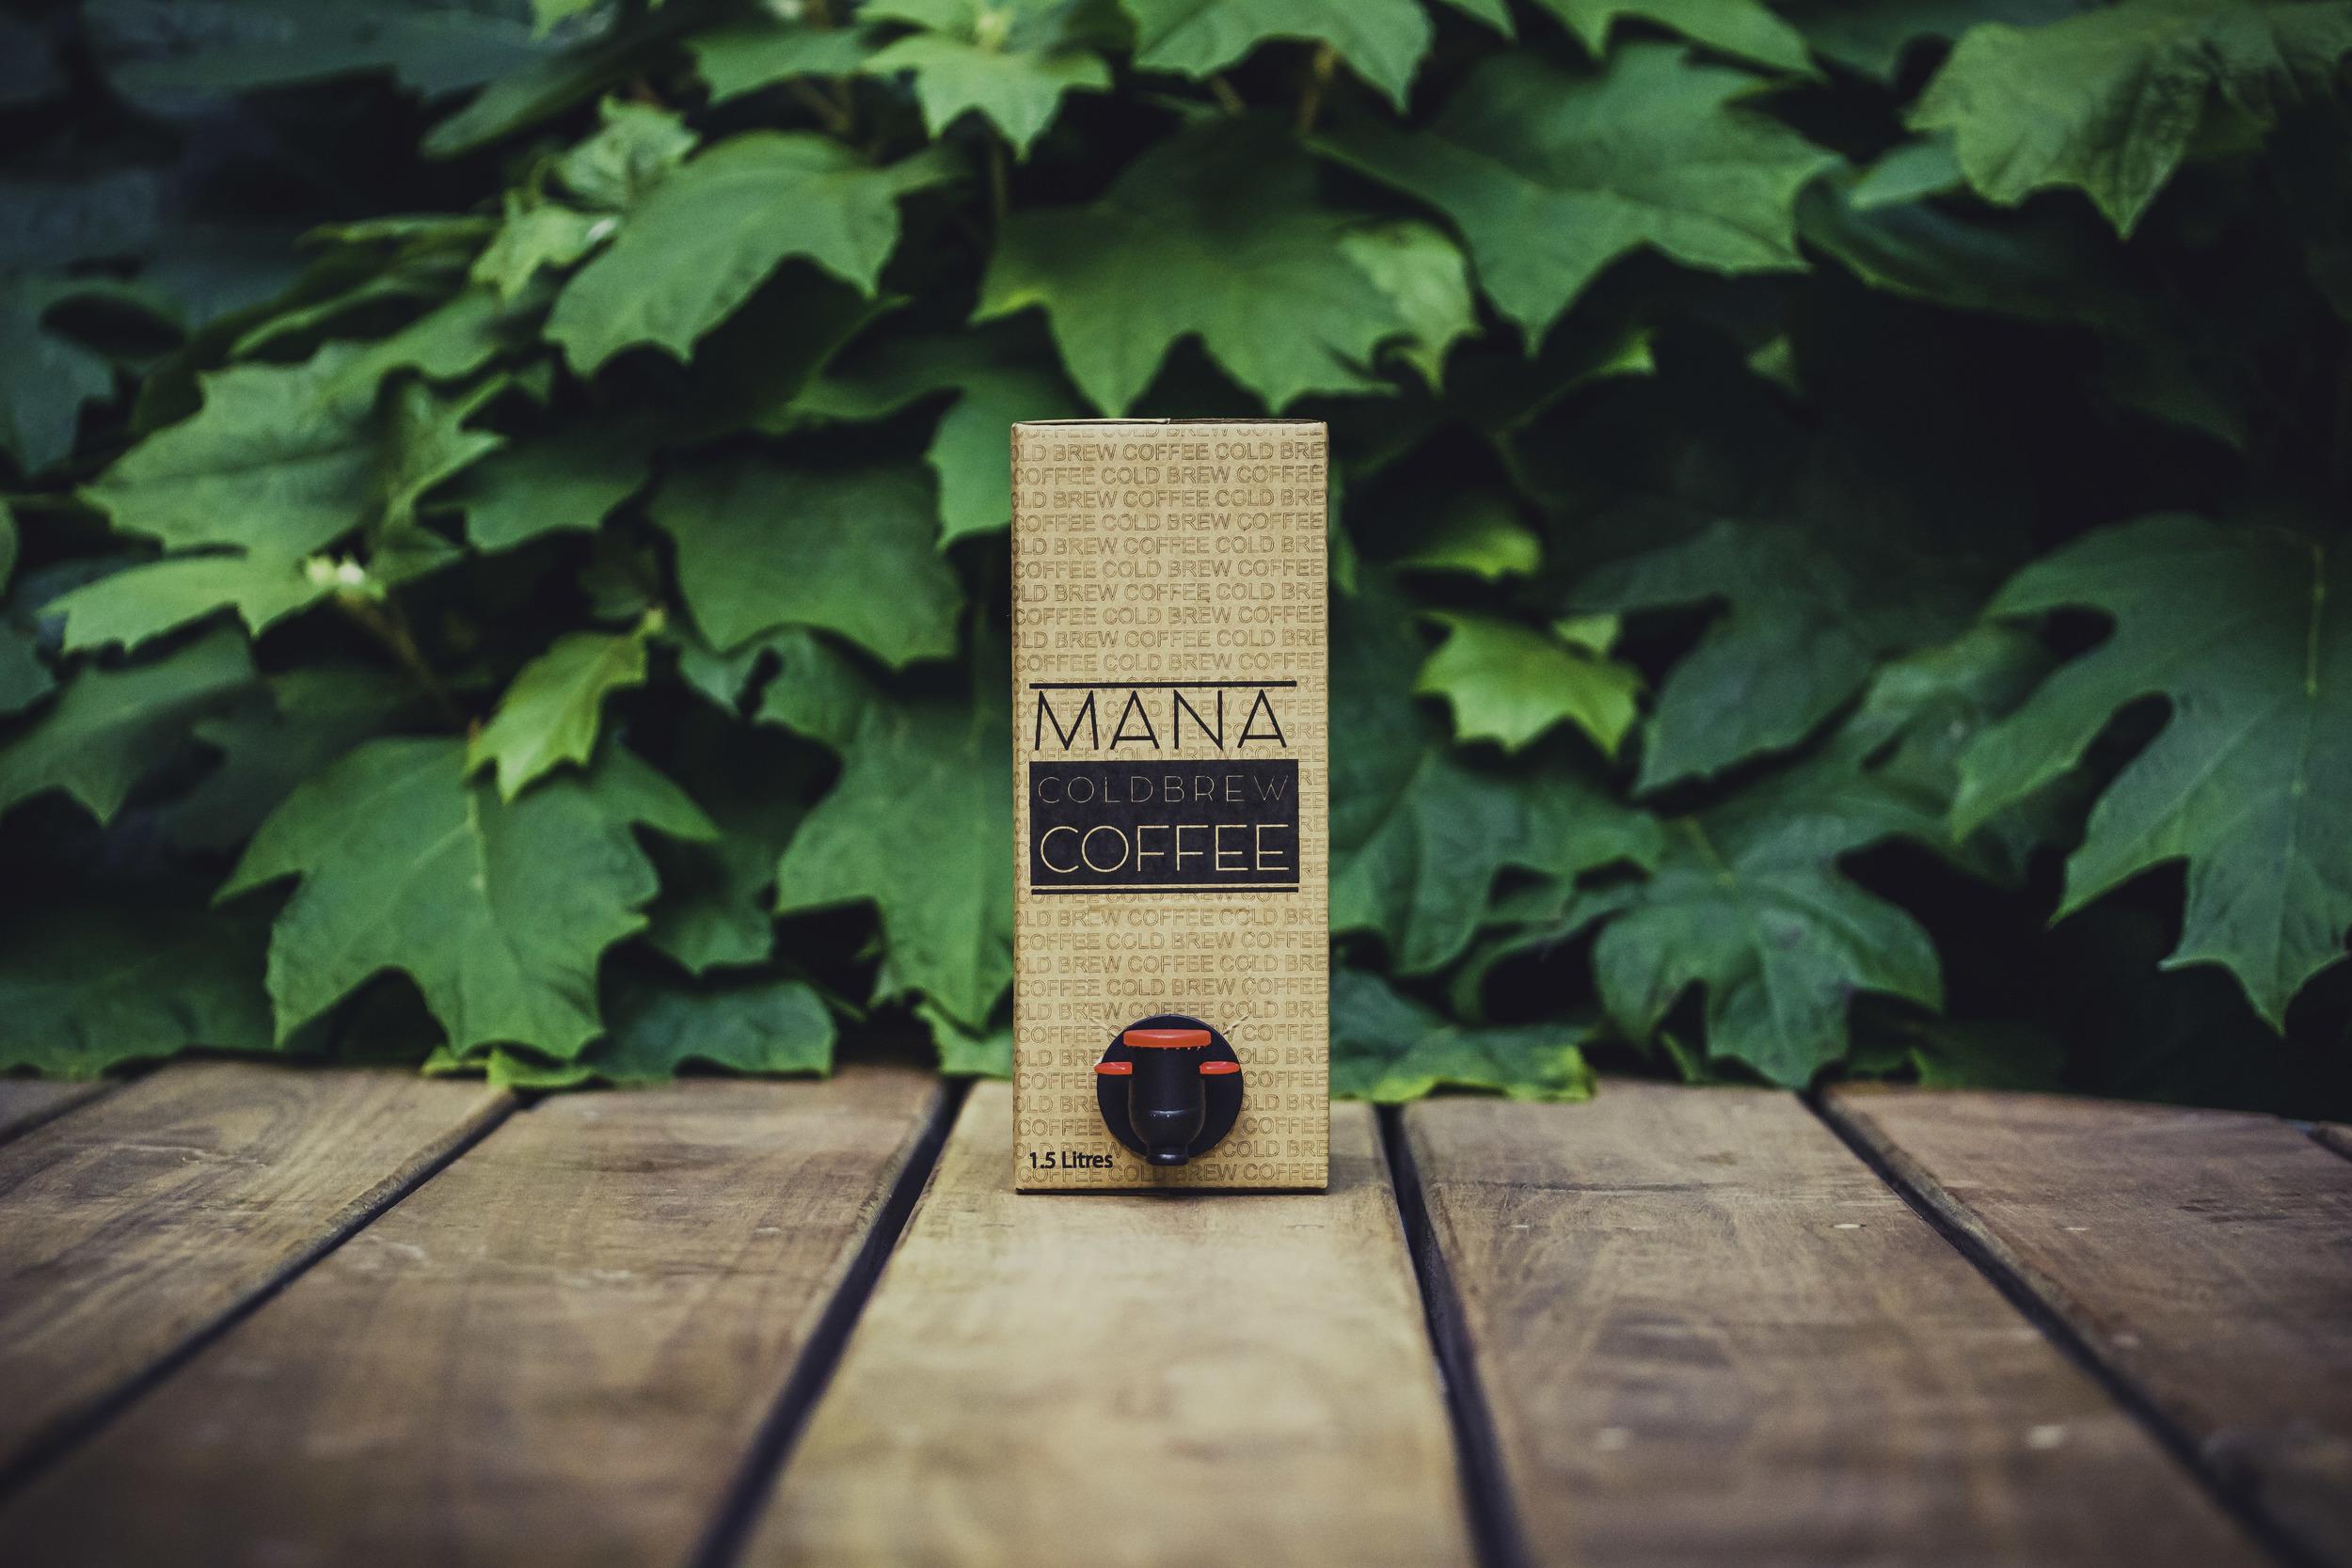 mana_box_green_1